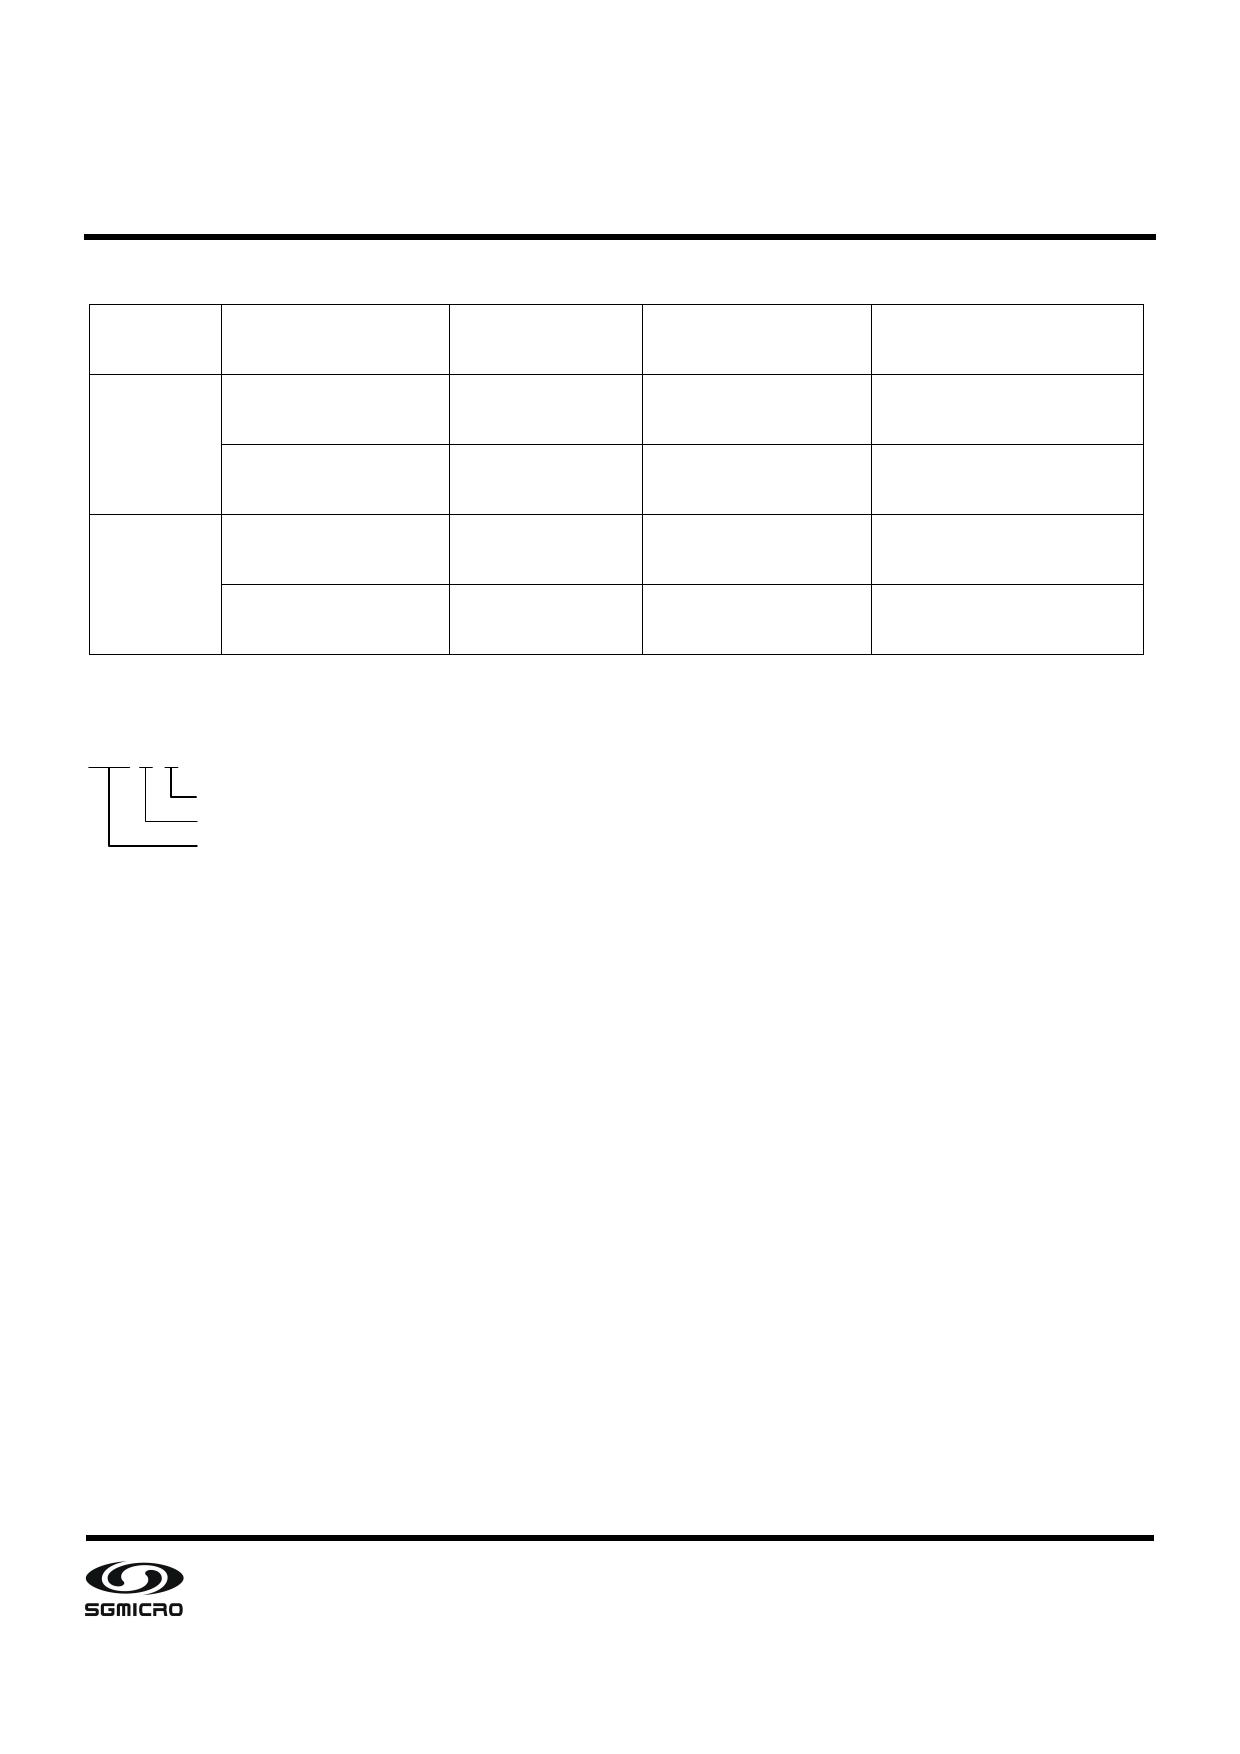 SGM8951 pdf, schematic